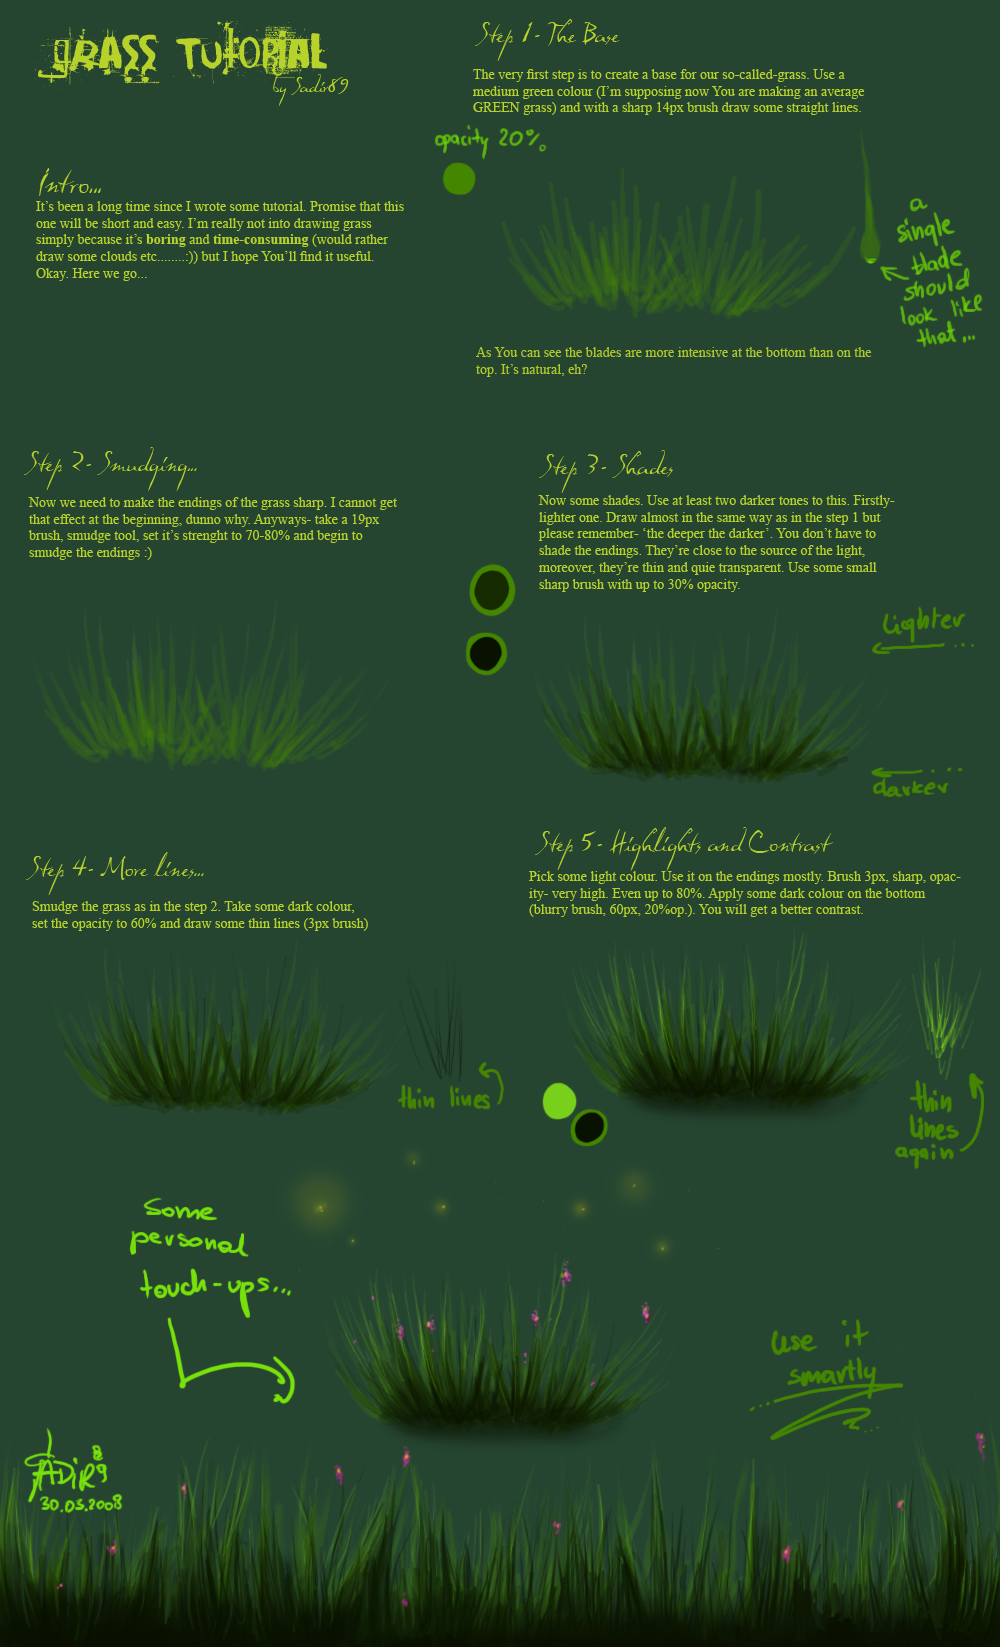 Grass tutorial by Sadir89